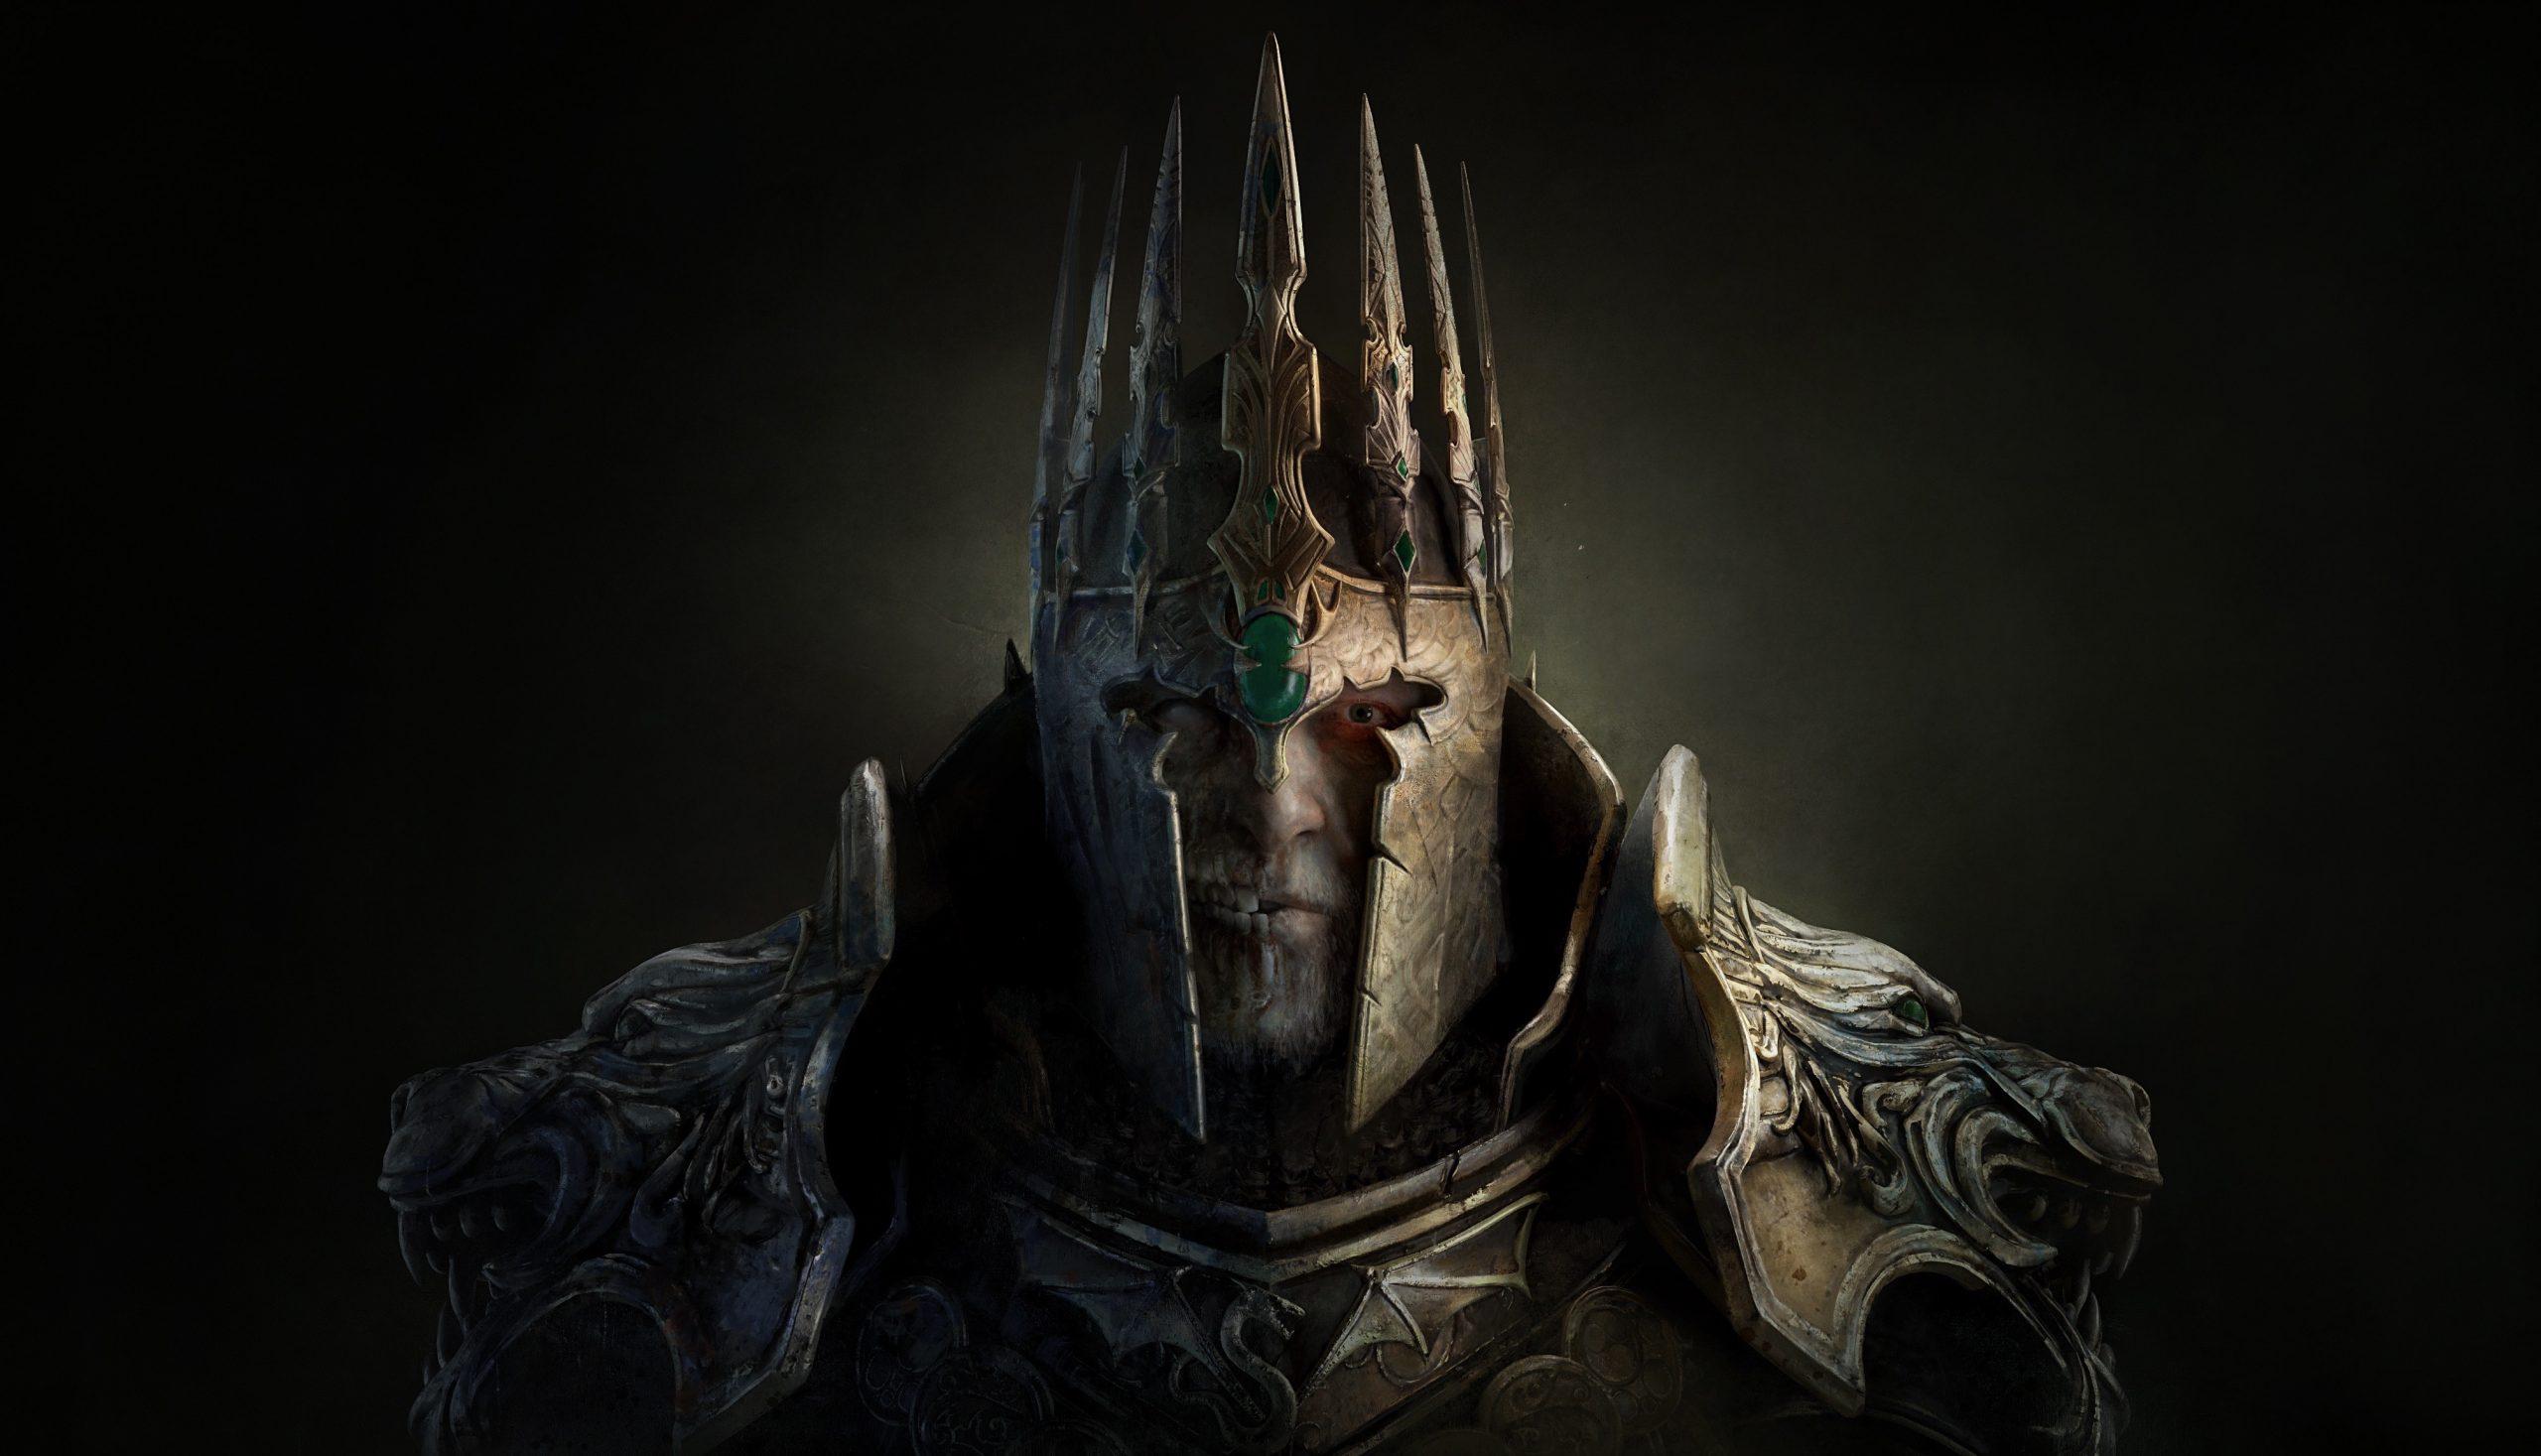 King Arthur: Knight's Tale Is A Dark Fantasy XCOM